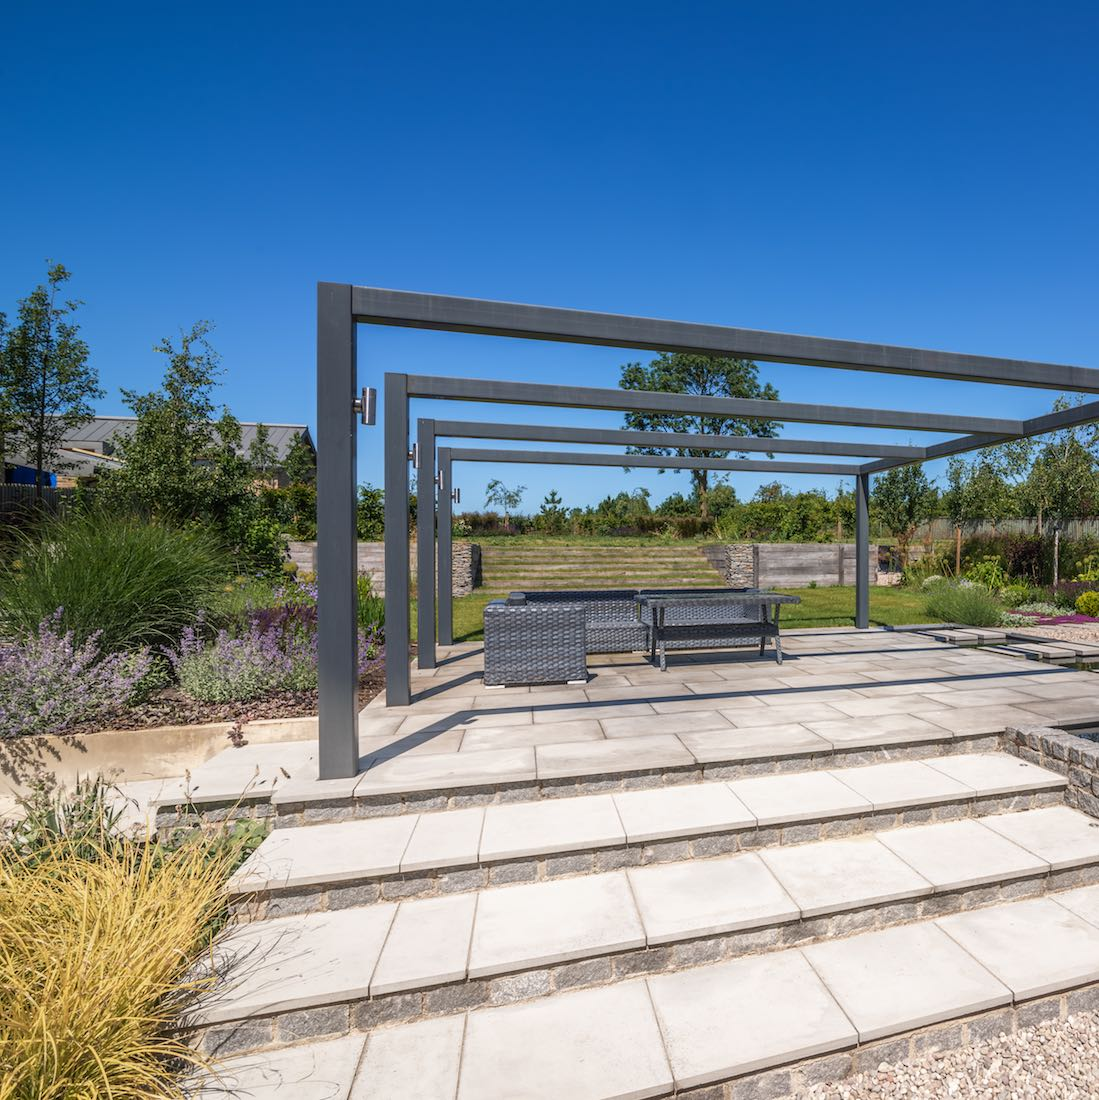 Contemporary Family Garden, 35 Bourn Caxton, Steel Pergola and Sandstone Steps